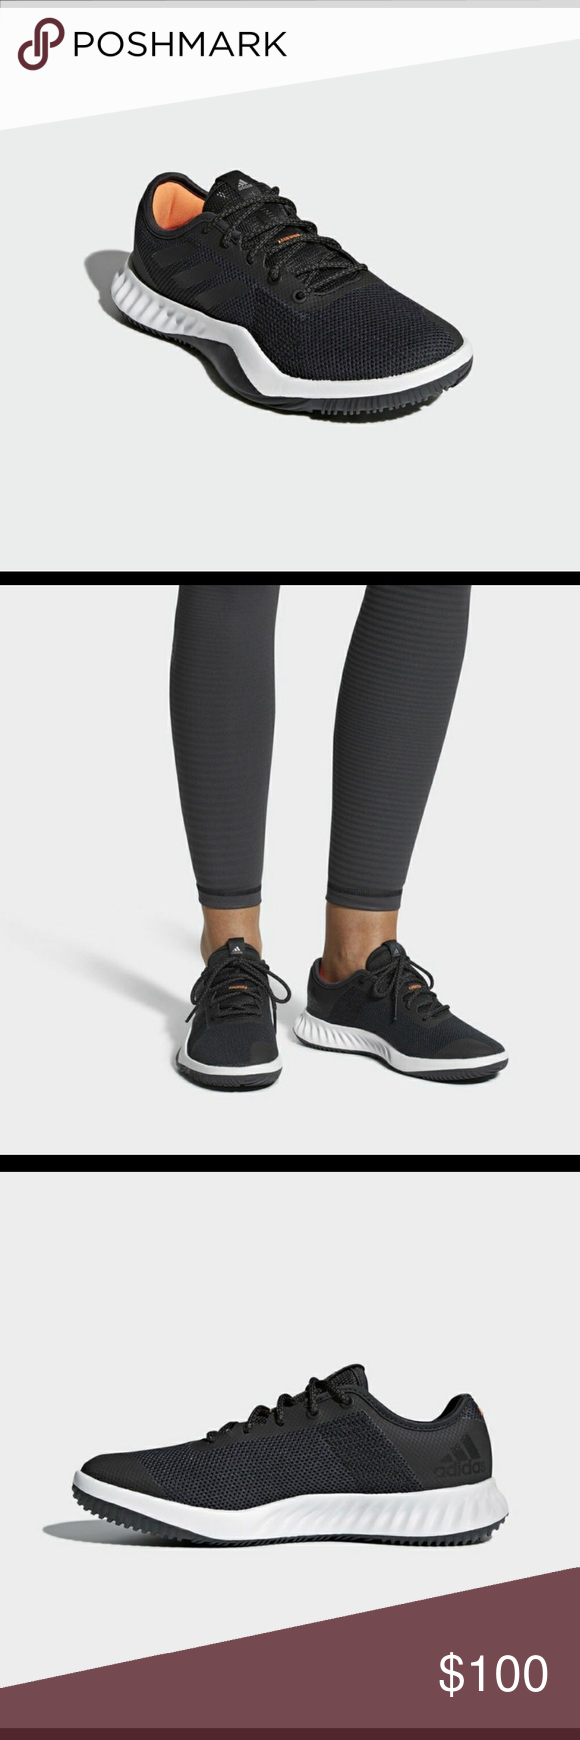 Adidas CRAZYTRAIN LT SHOES CG3496 H1 | Shoes, Training shoes, Turf ...